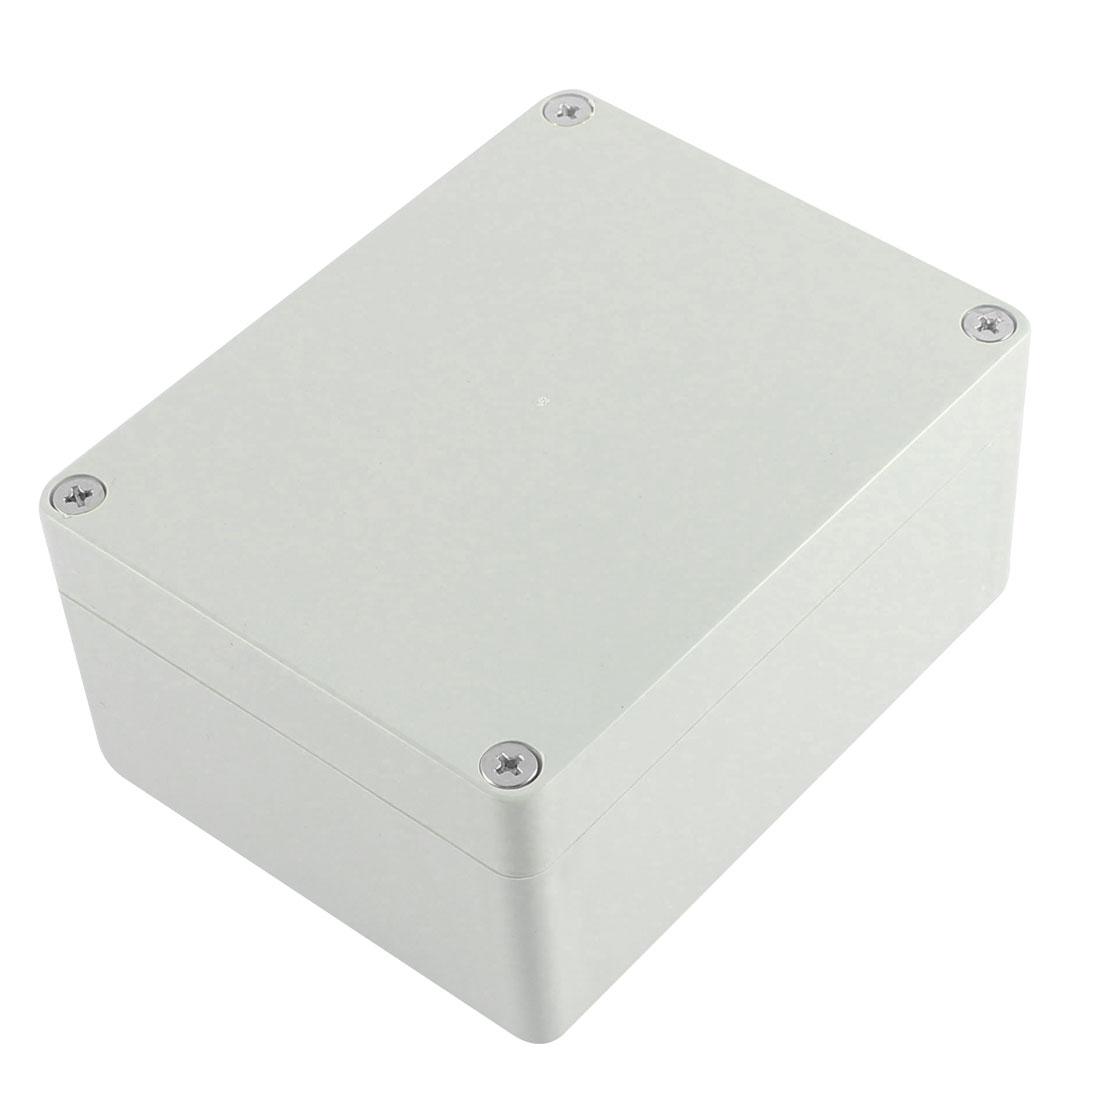 Waterproof Plastic Electronic Project Box Enclosure Case 115 x 90 x 55mm